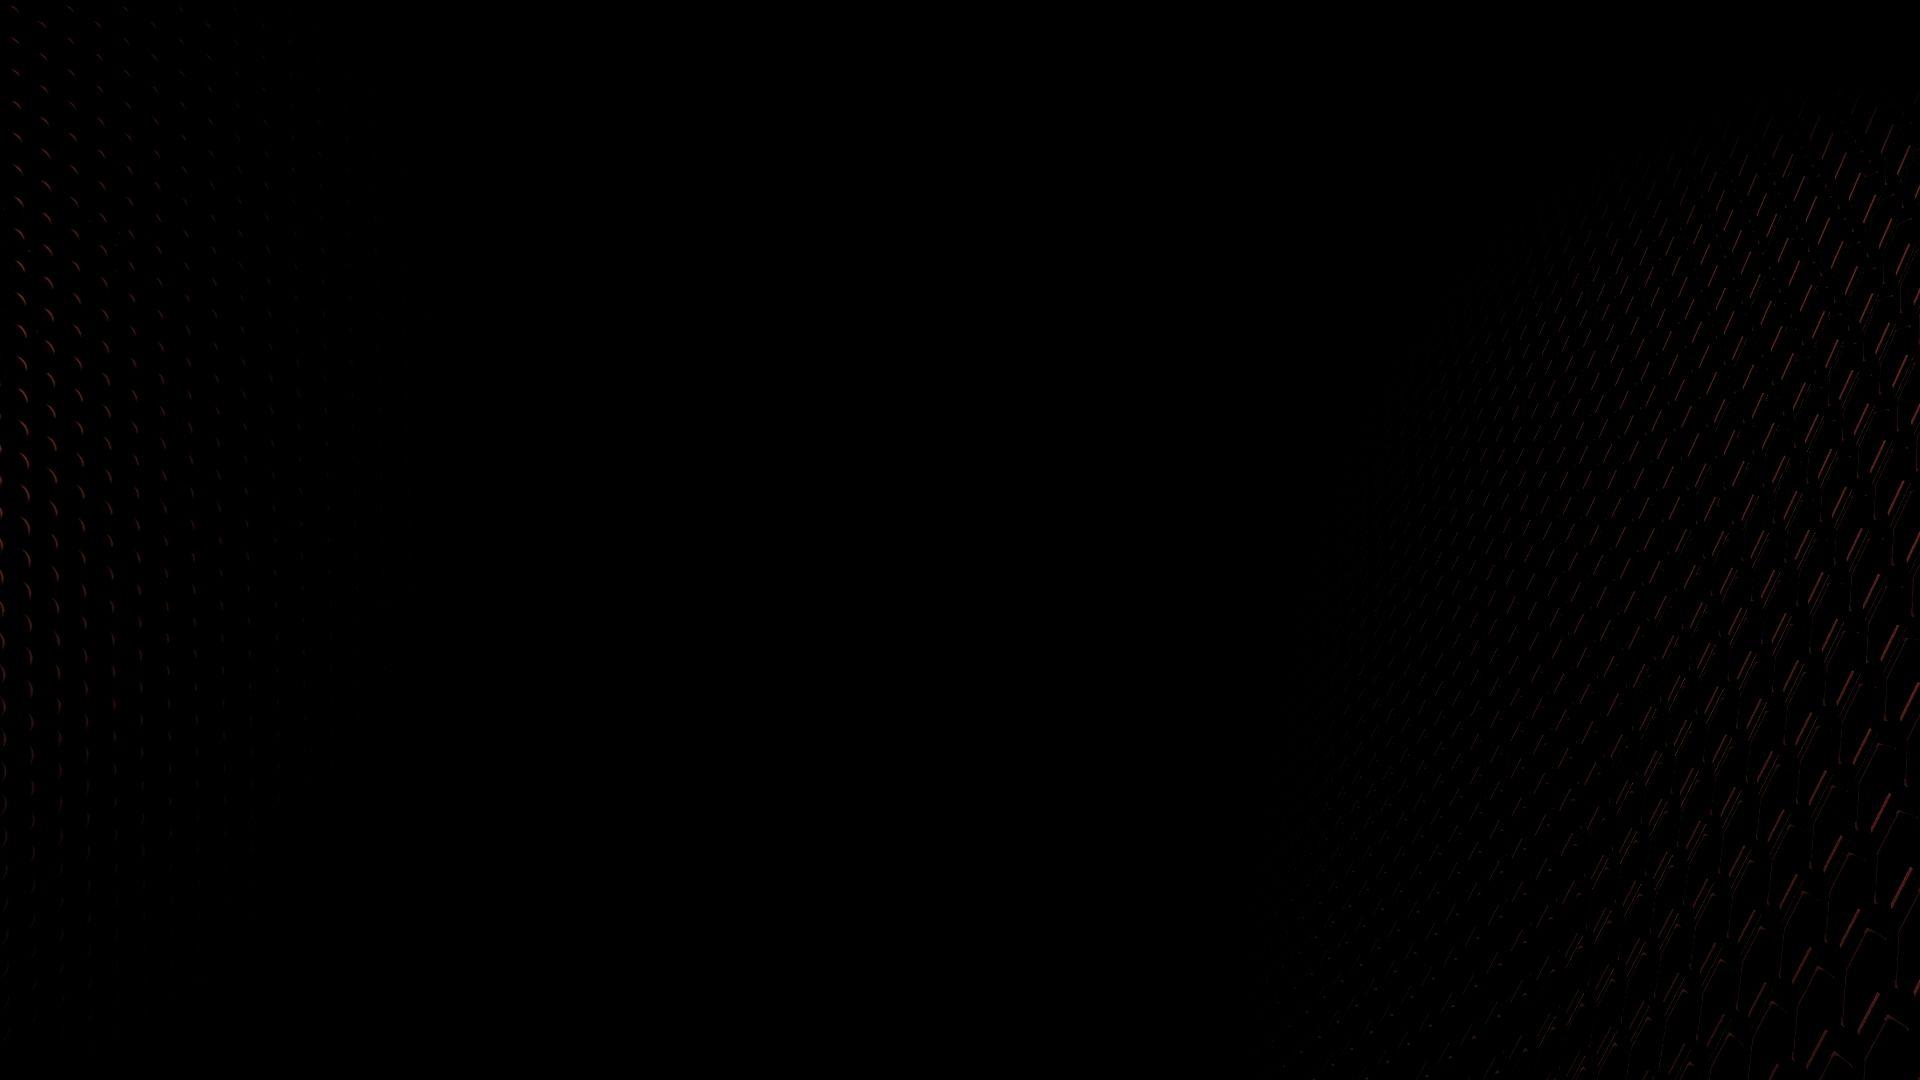 Plain Black computer Wallpaper